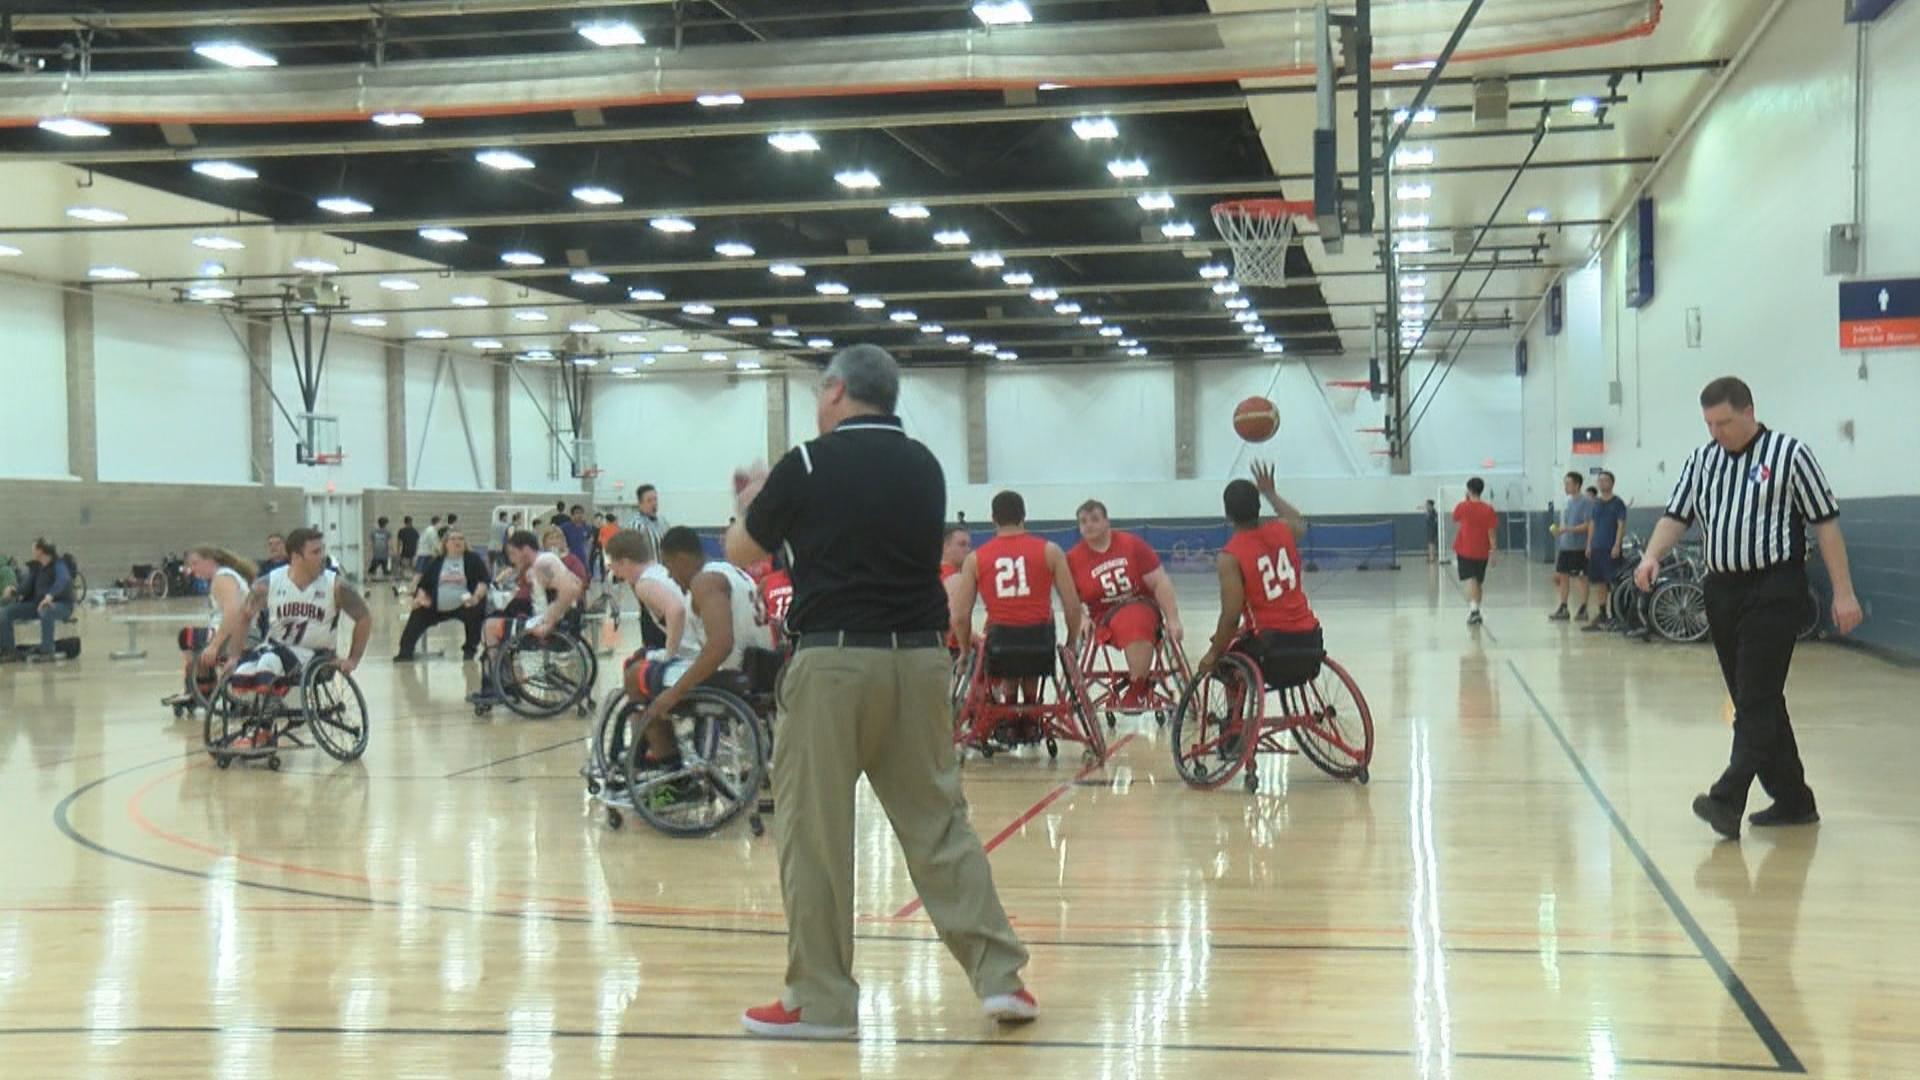 wheelchair basketball_1552425520445.jpg.jpg